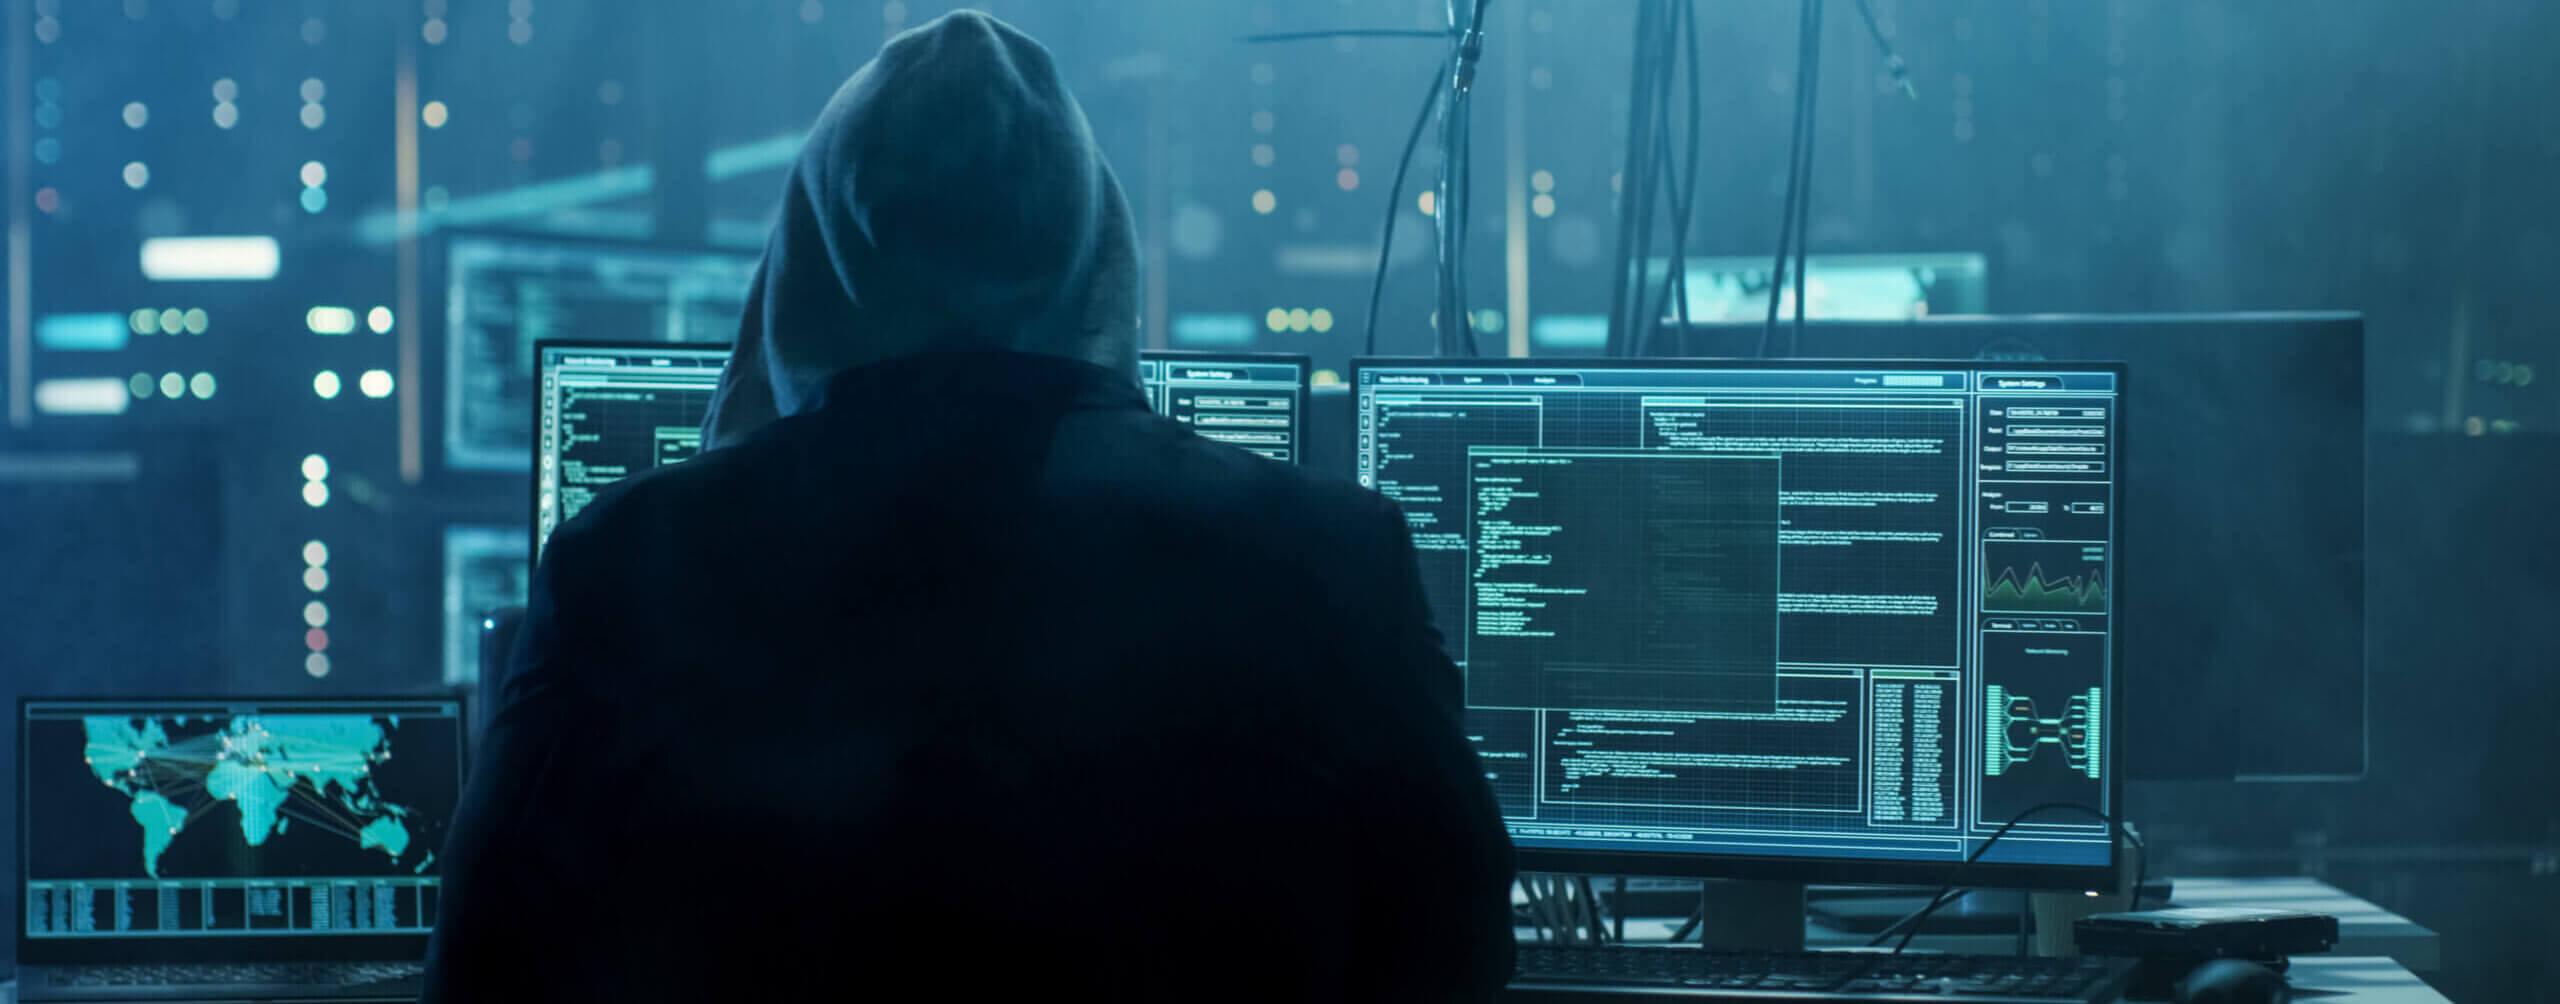 CyberActive